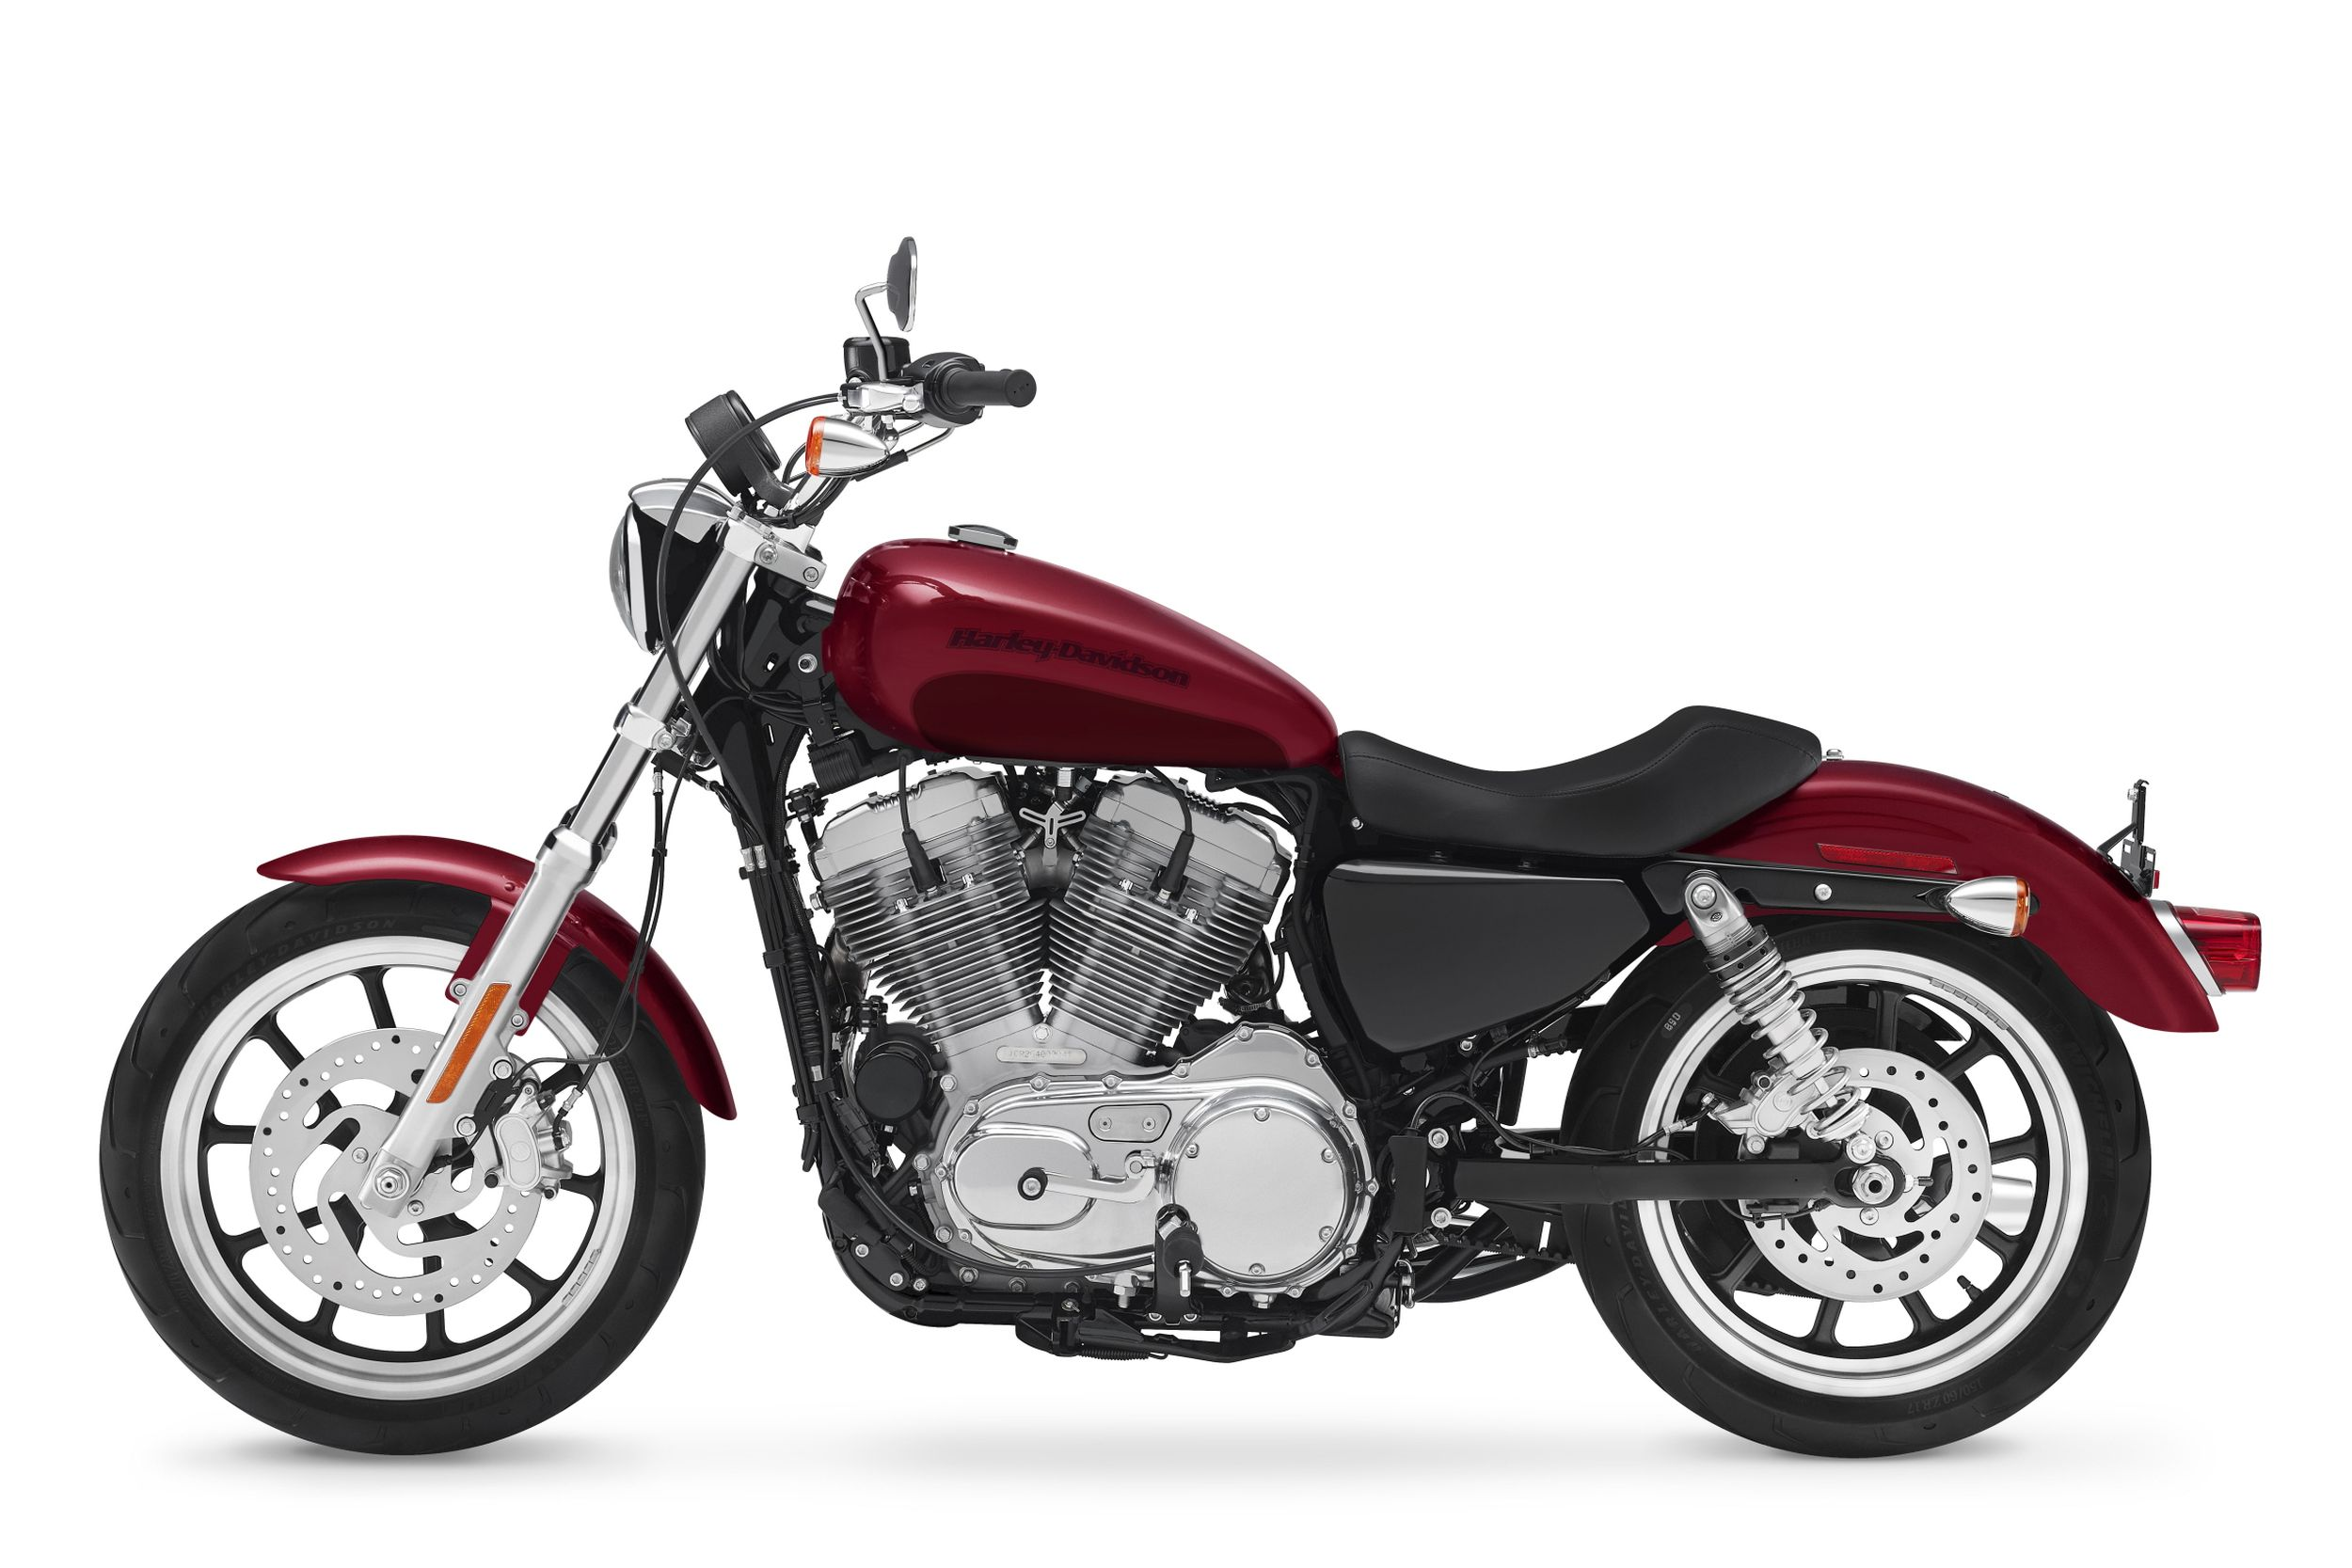 Testberichte Harley Davidson Sportster